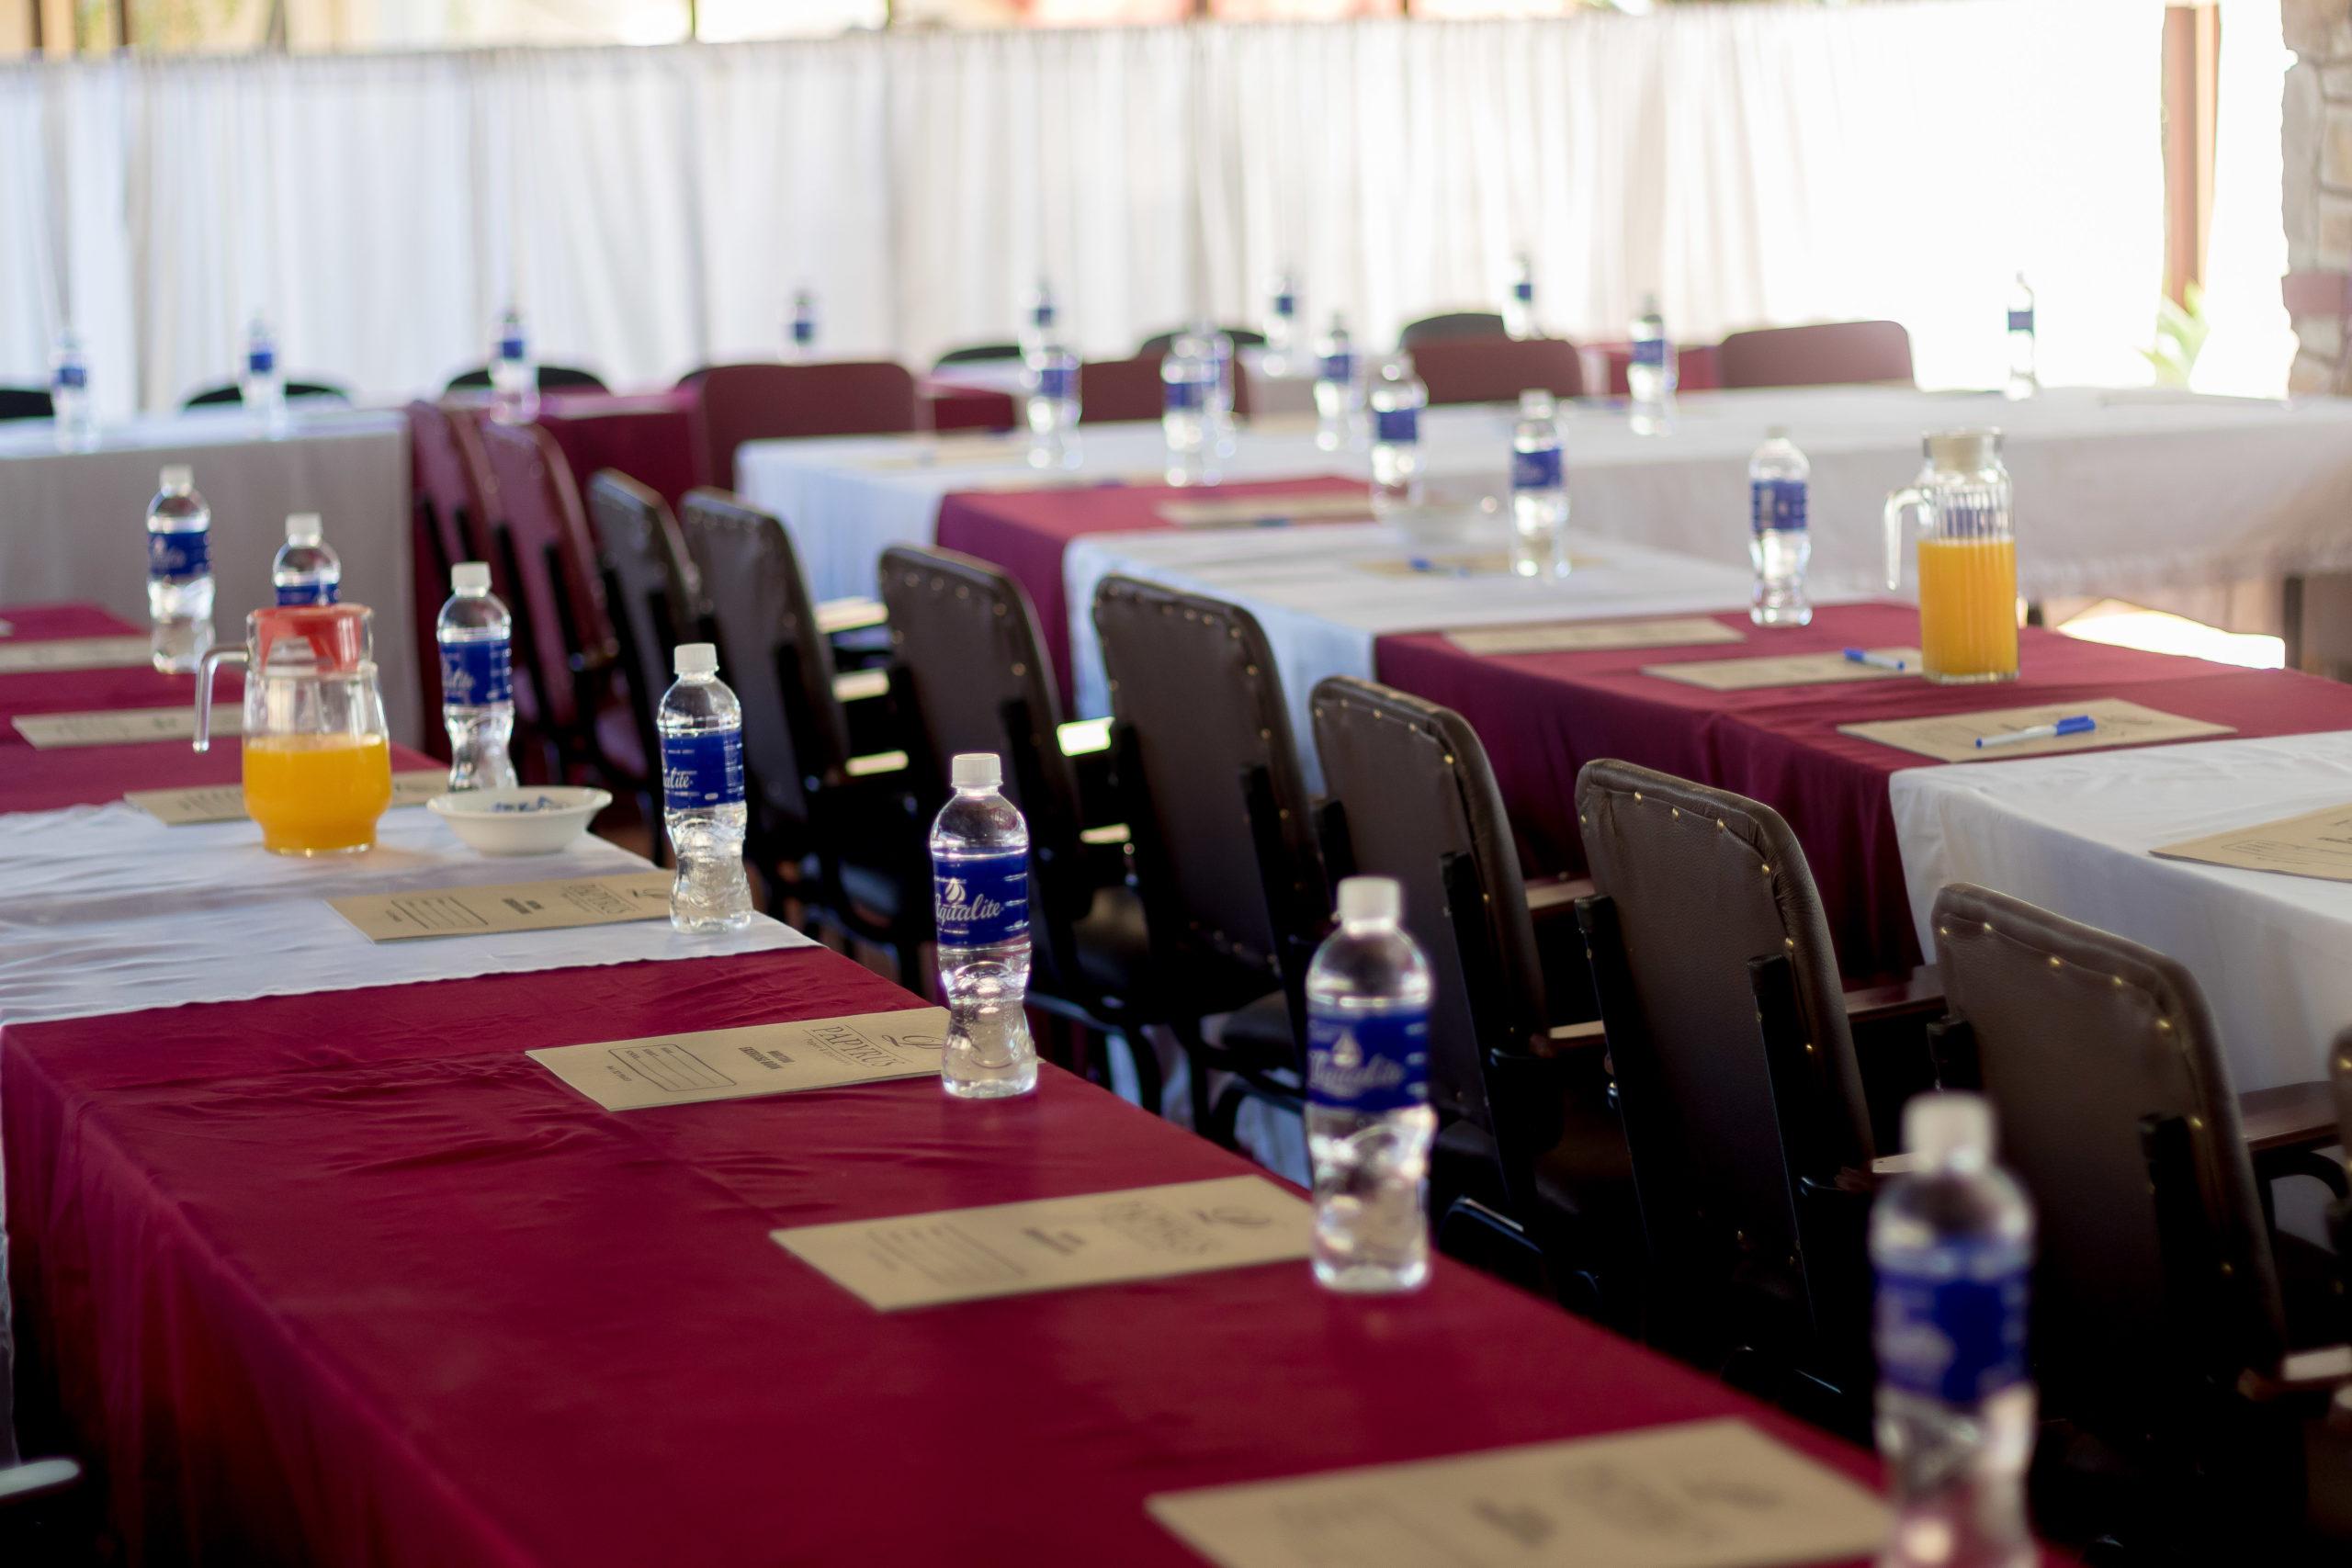 Bulawayo conference venue - Bulawayo workshop facilities - Lalani Hotel & Conference Centre